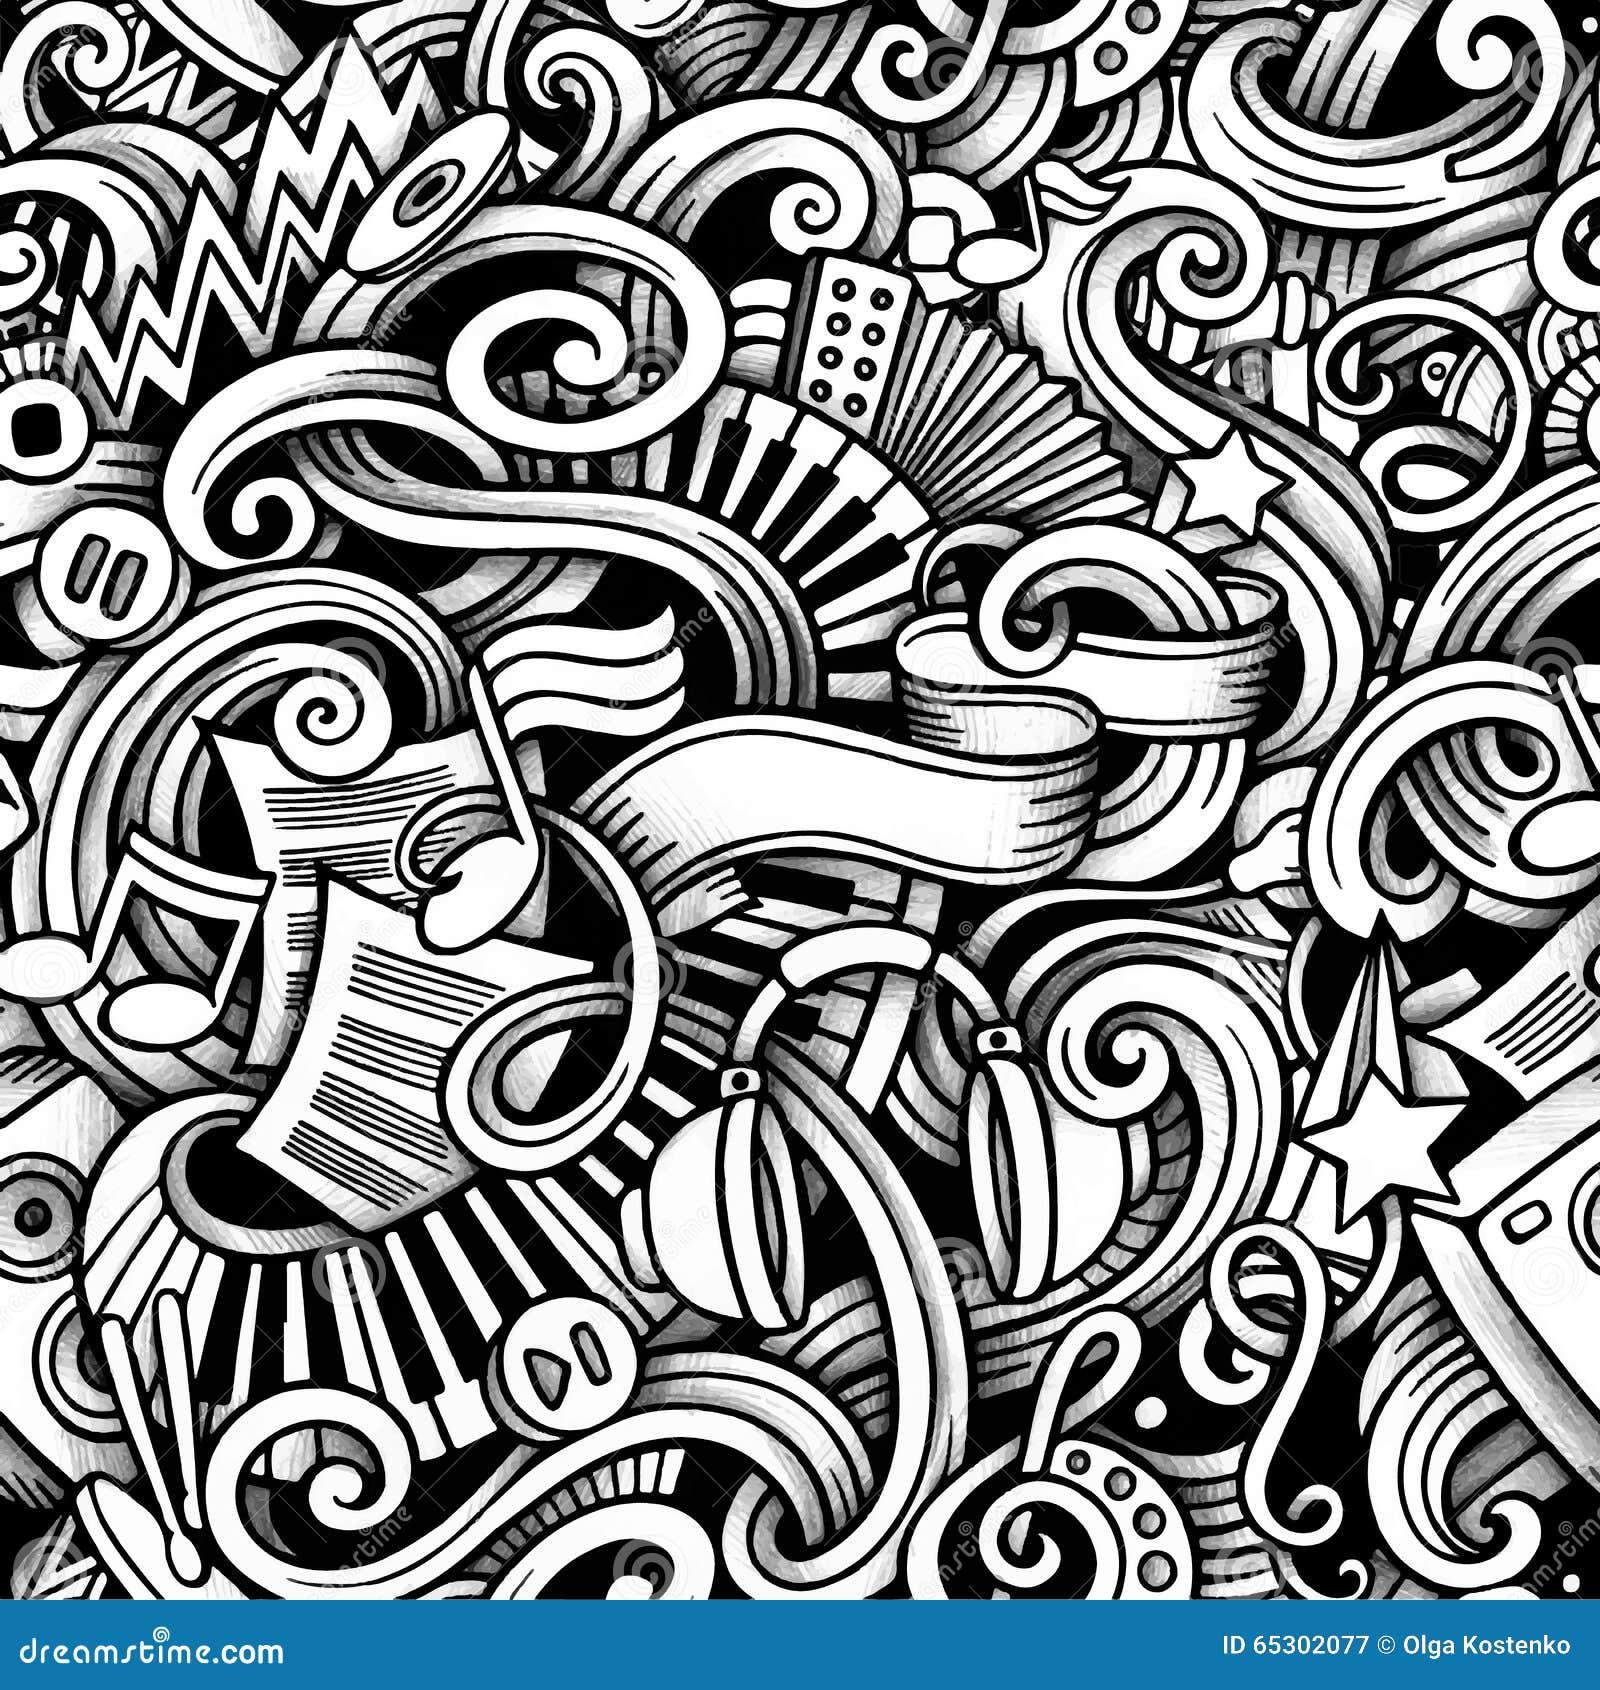 Cartoon Hand Drawn Doodles Music Seamless Pattern Stock